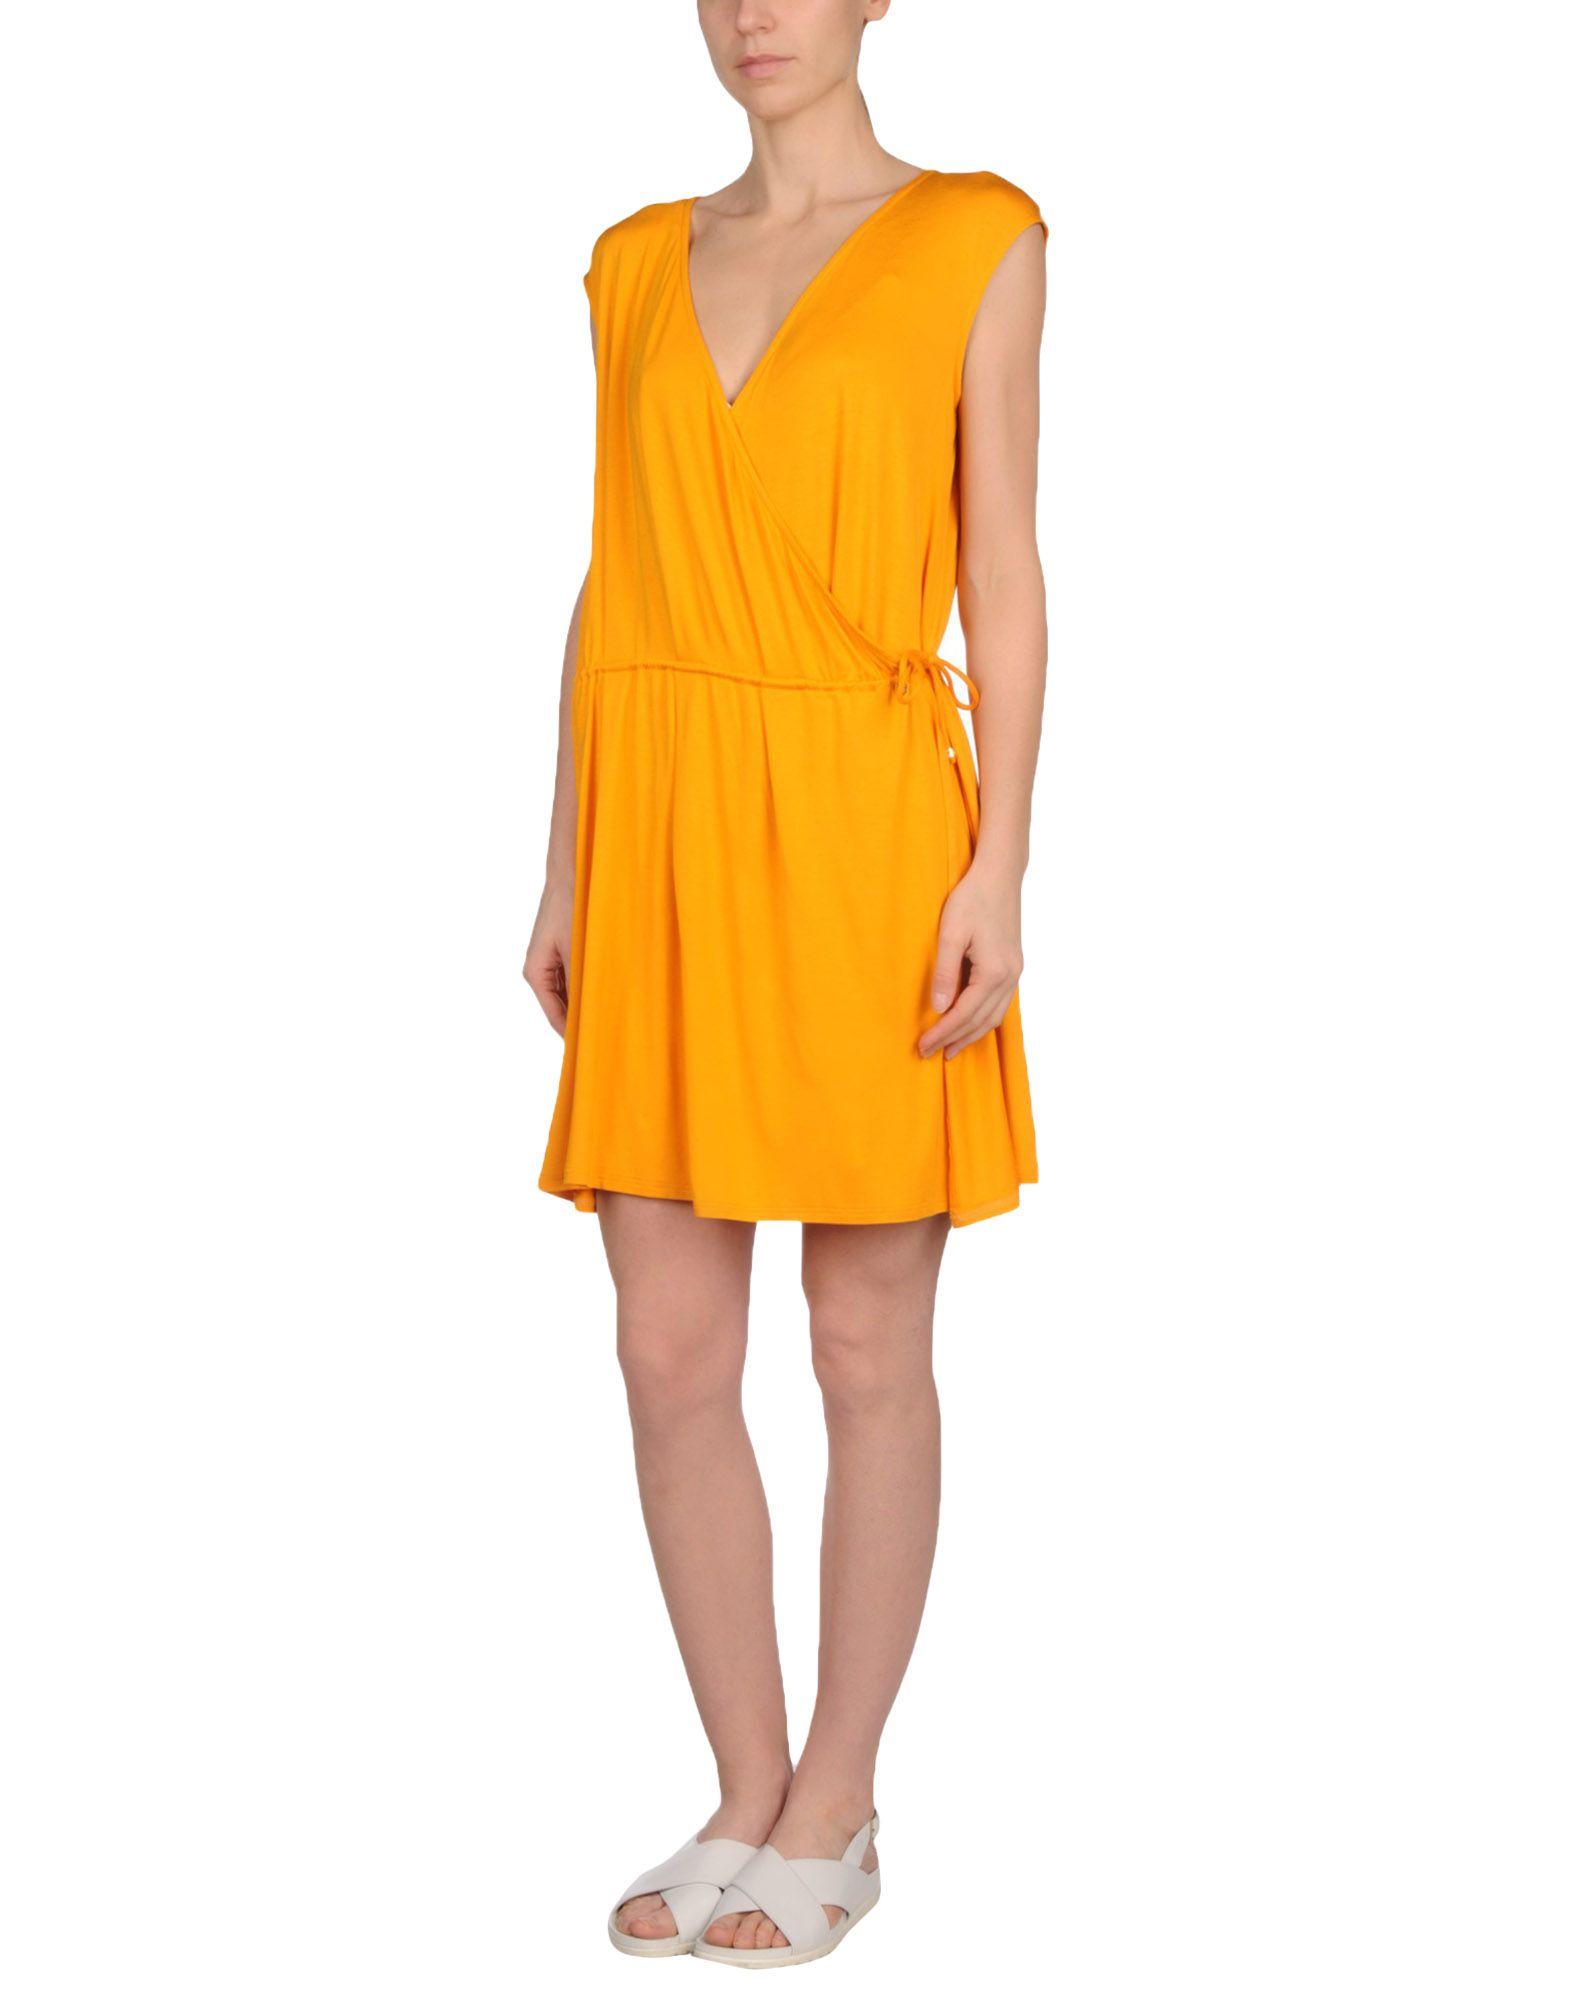 MISS NAORY Пляжное платье платье miss selfridge miss selfridge mi035ewxyg42